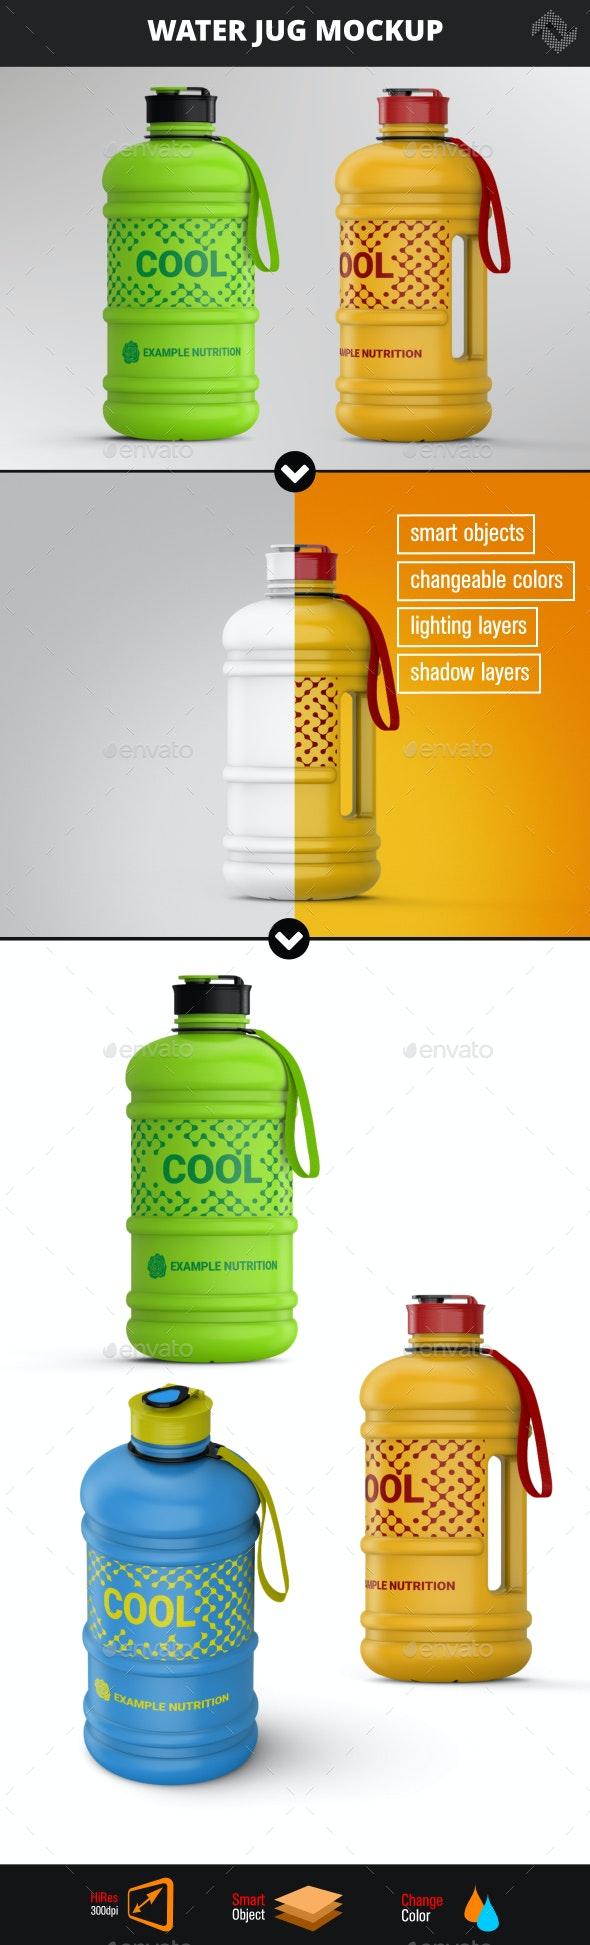 Sports Nutrition Water Jug Bottle Mockup - Packaging Product Mock-Ups